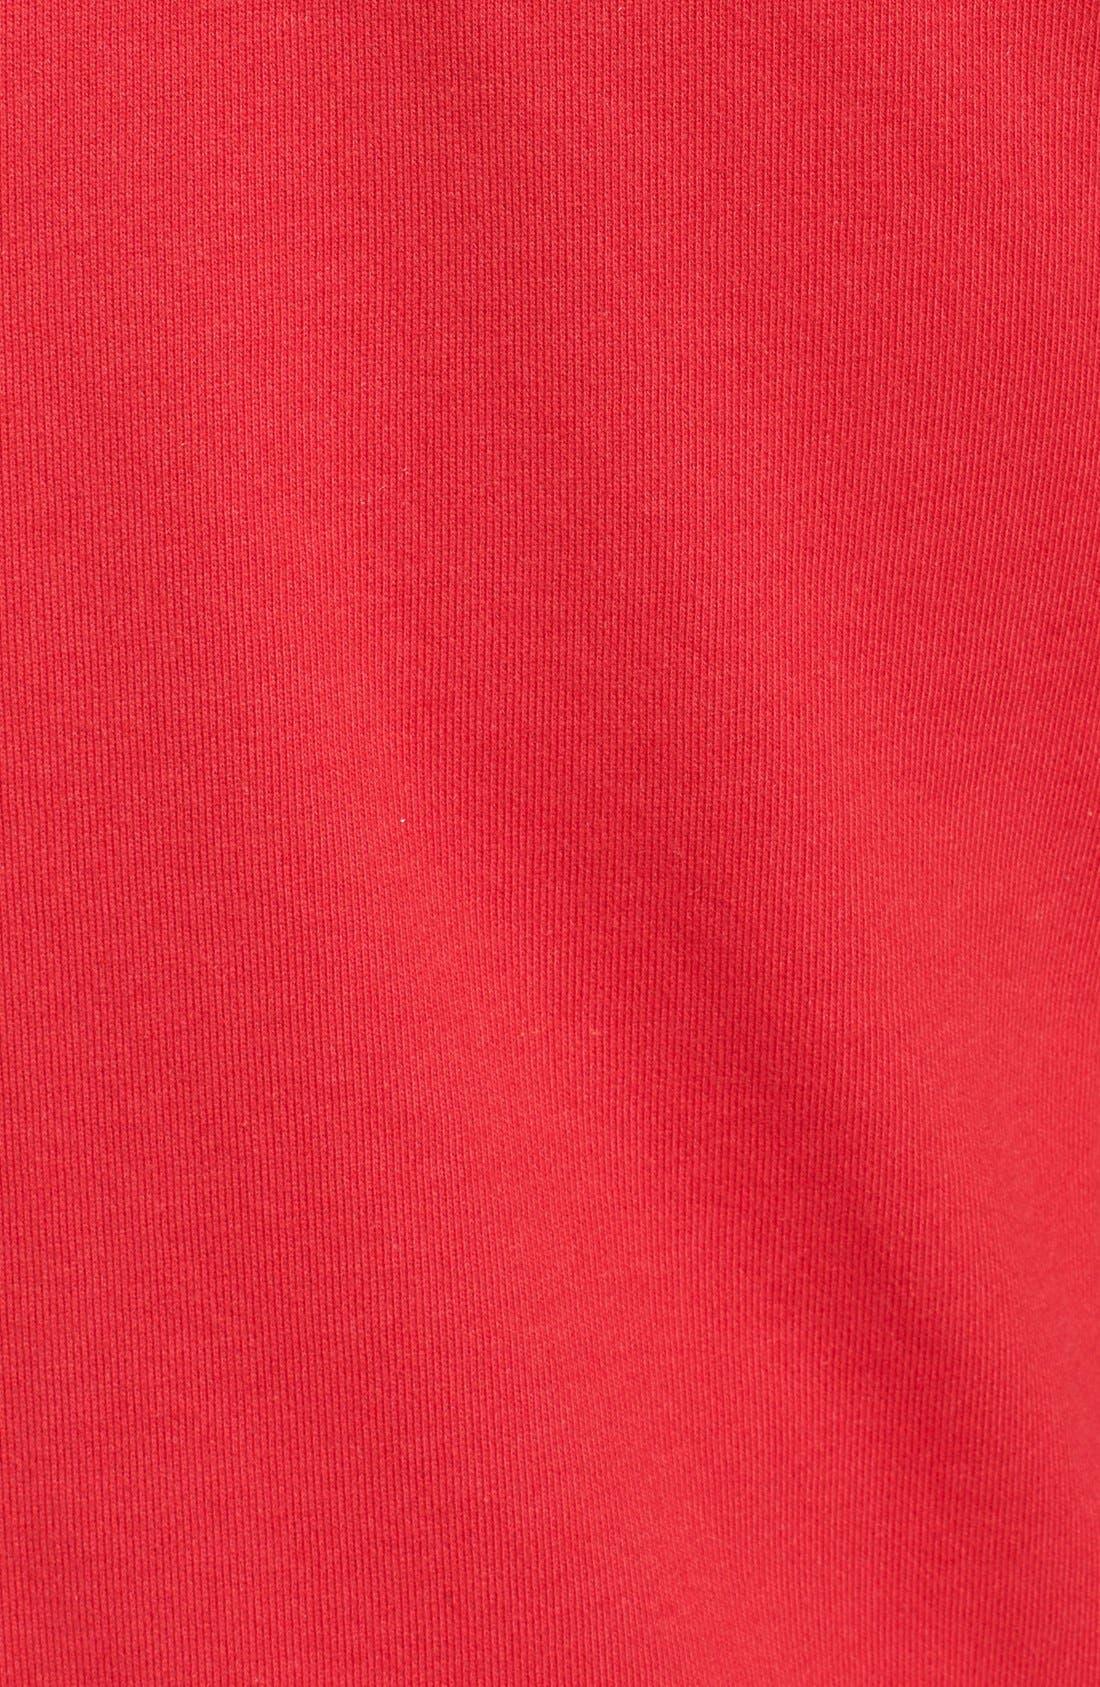 Alternate Image 3  - Mitchell & Ness 'St. Louis Cardinals' Full Zip Hoodie